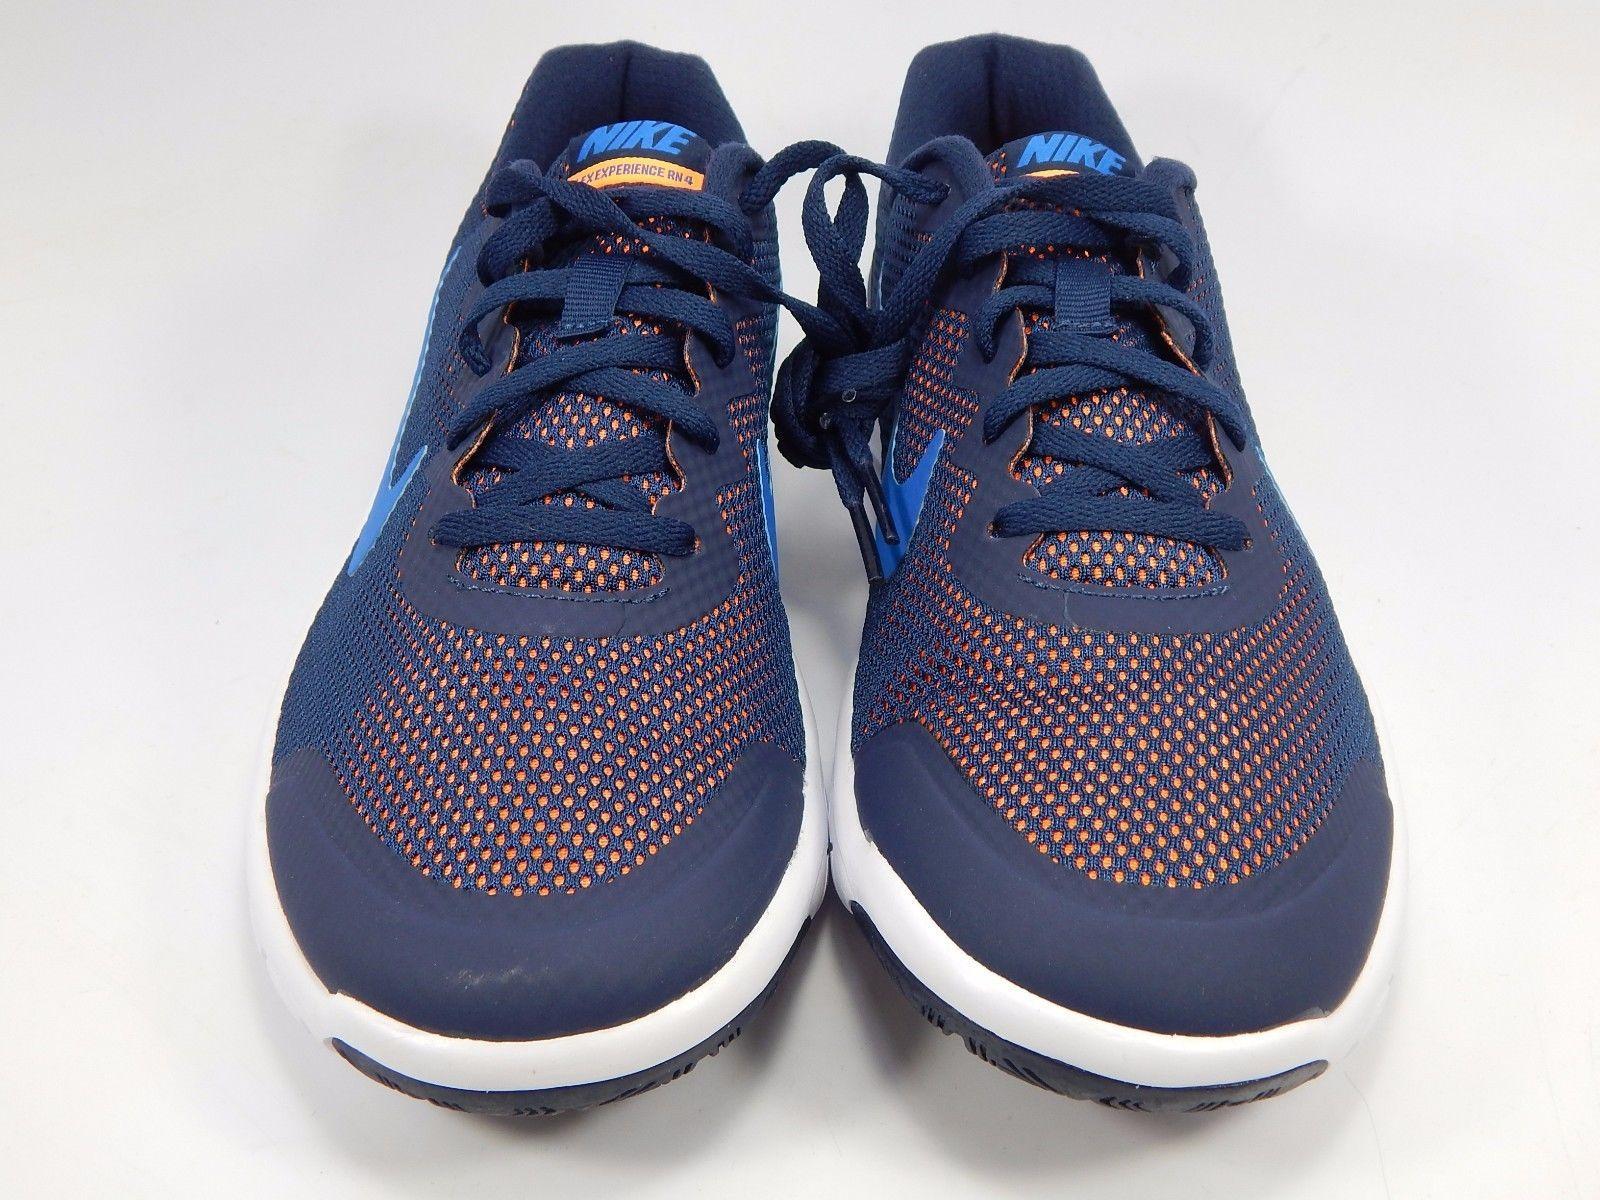 a11abc6b1df56 Nike Flex Experience 4 Big Kid s Youth Shoes Size 7 Y (M) EU 40 Blue ...